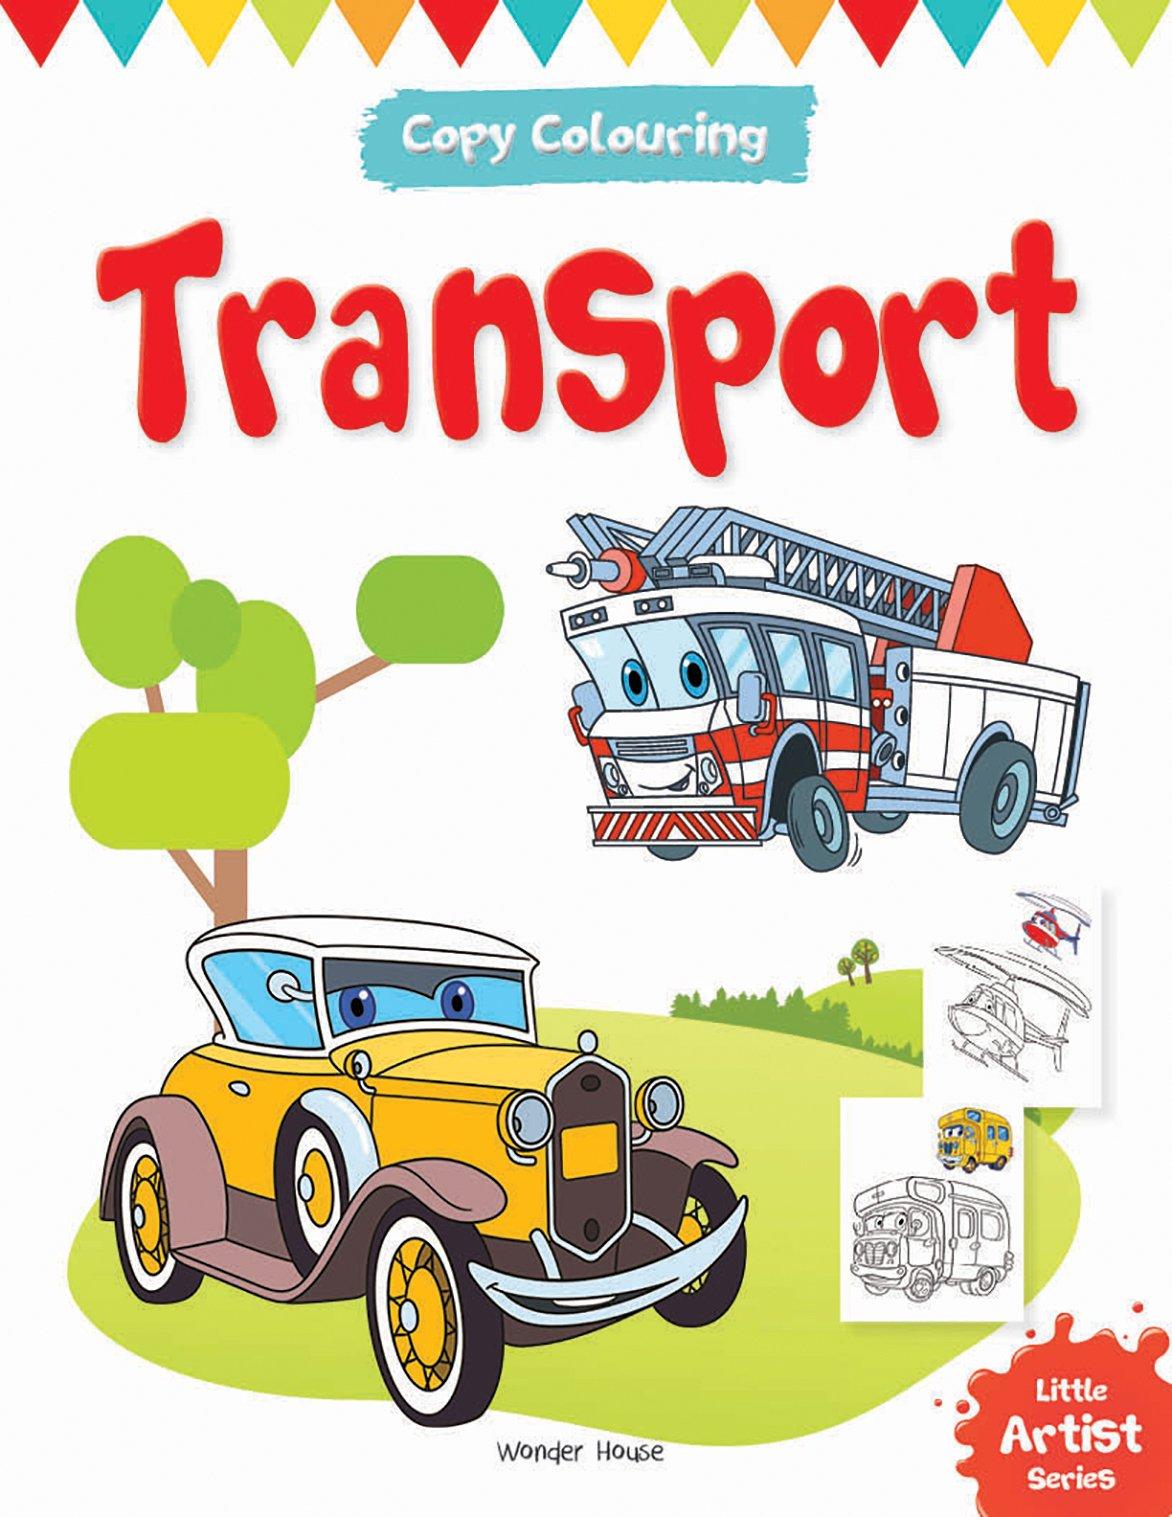 Little Artist Series - Transport : Copy Colouring Books